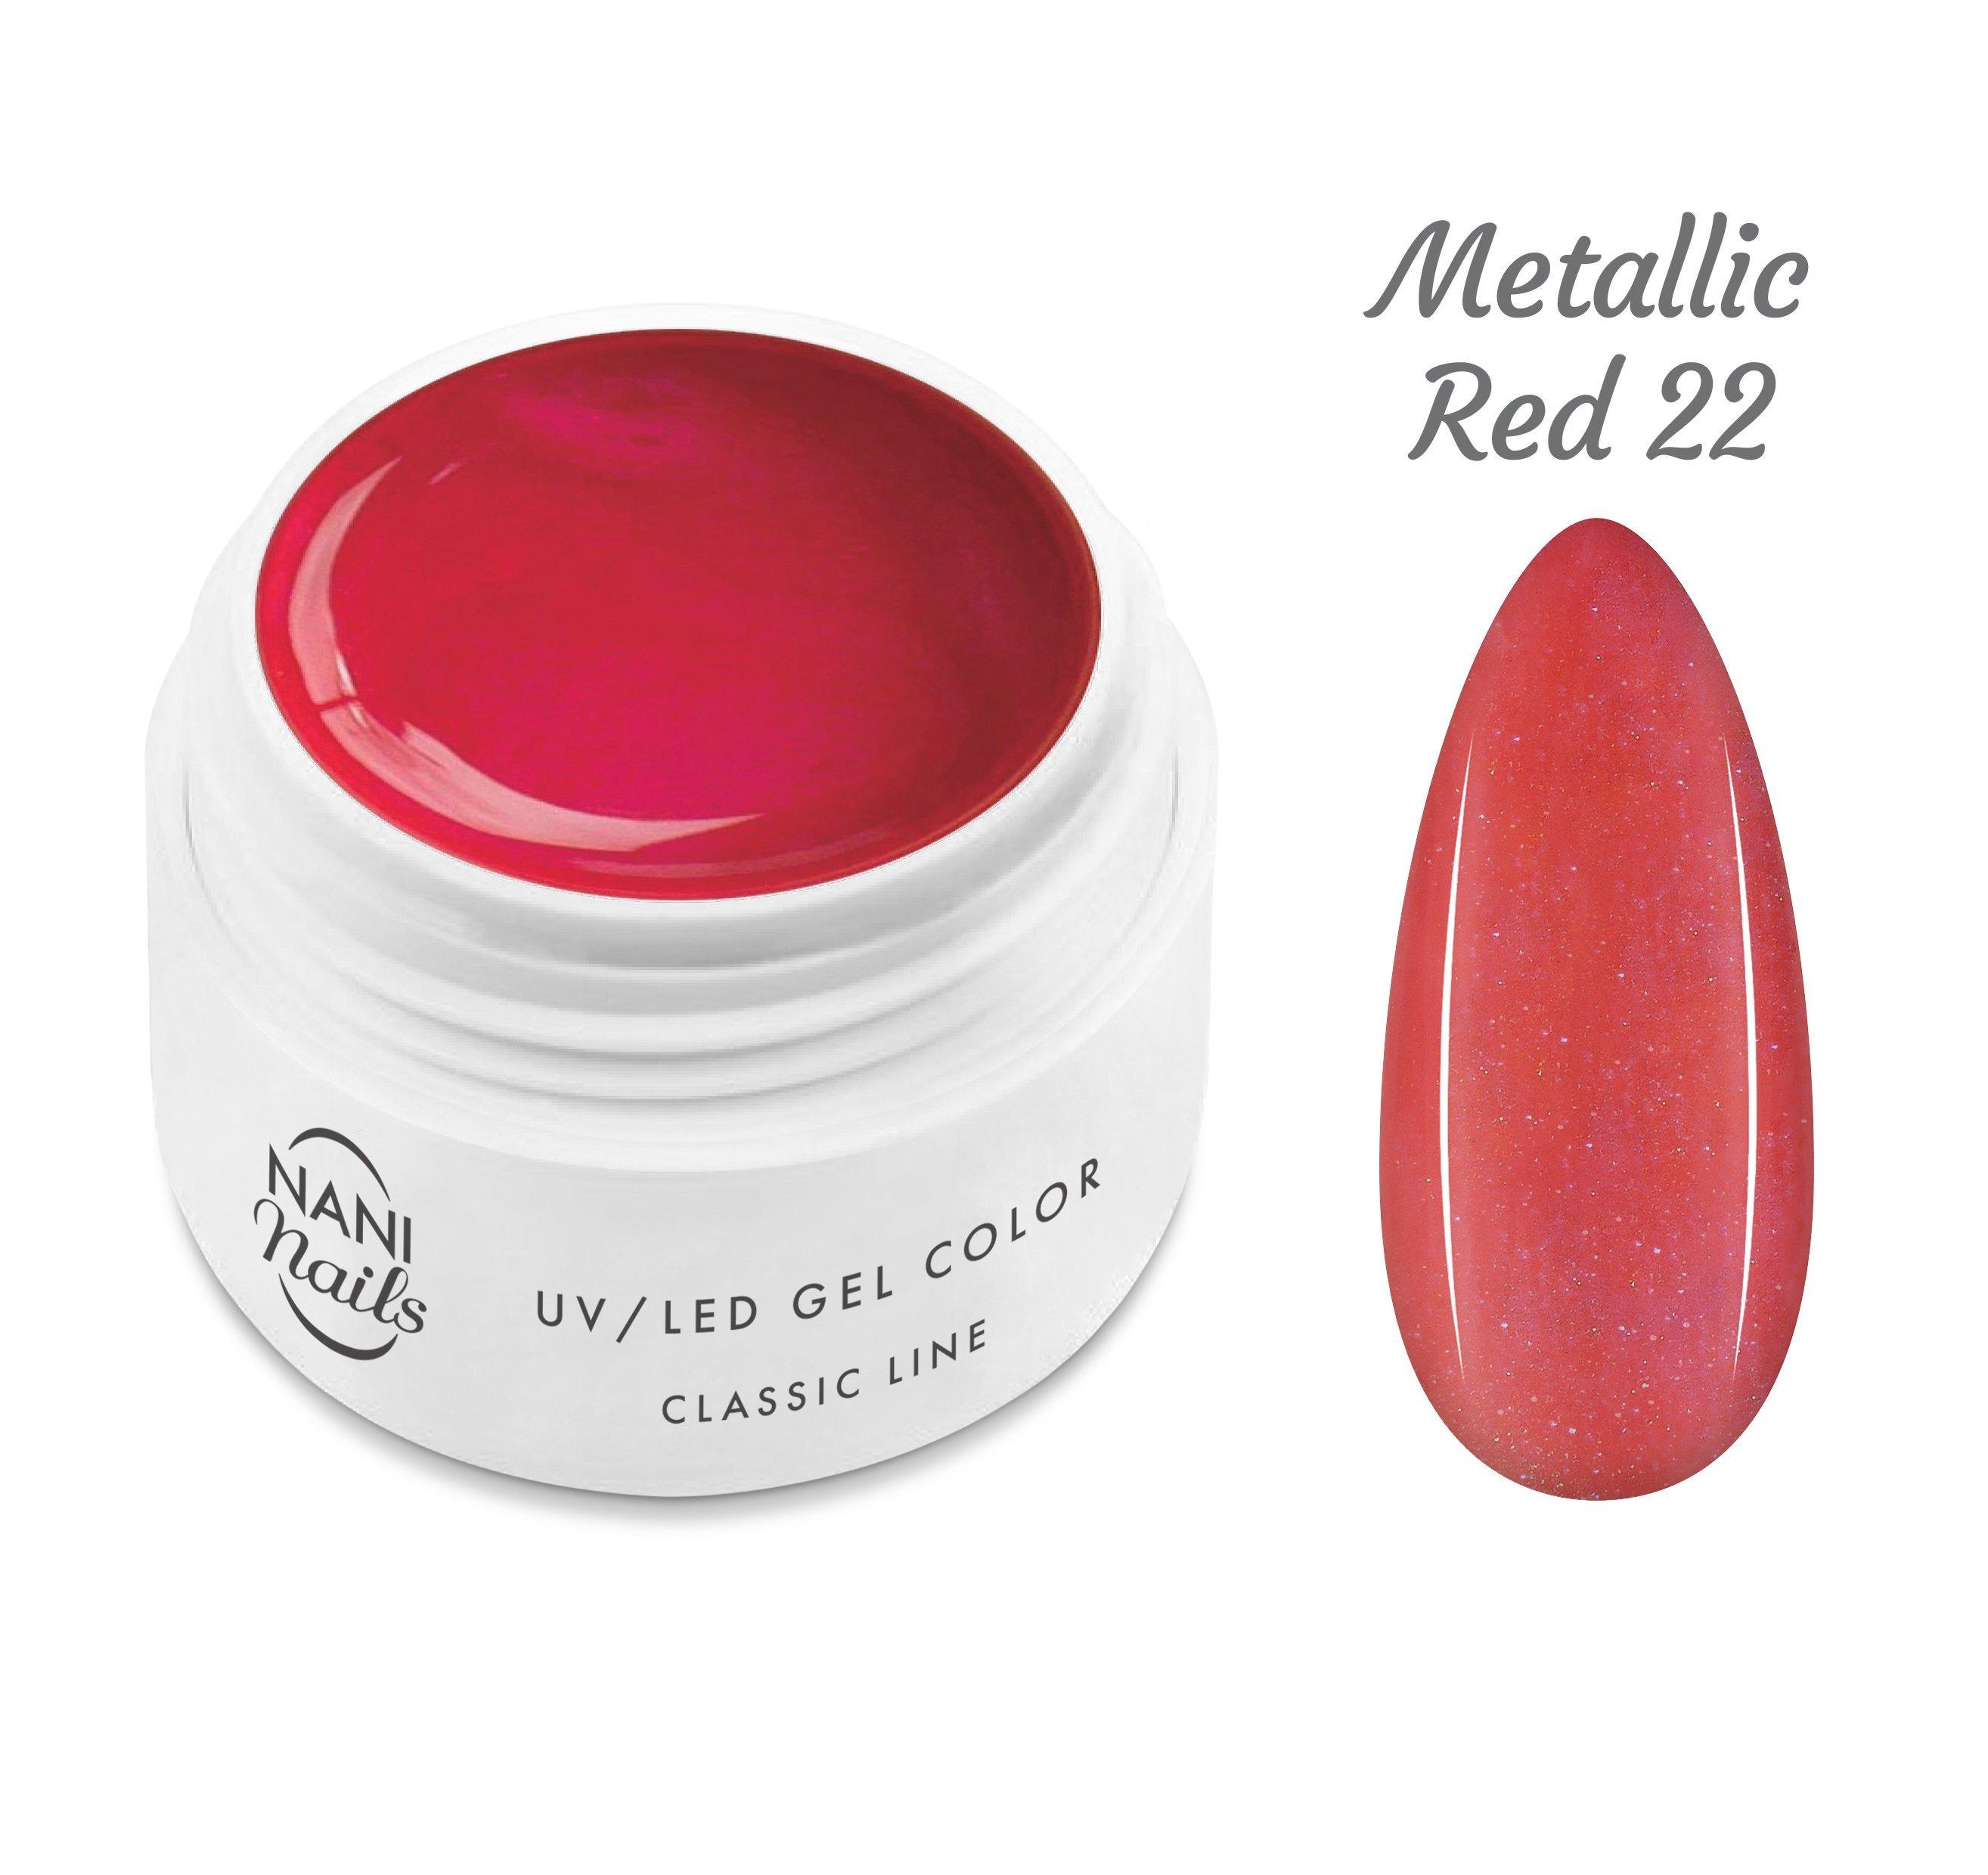 NANI UV gél Classic Line 5 ml - Metallic Red